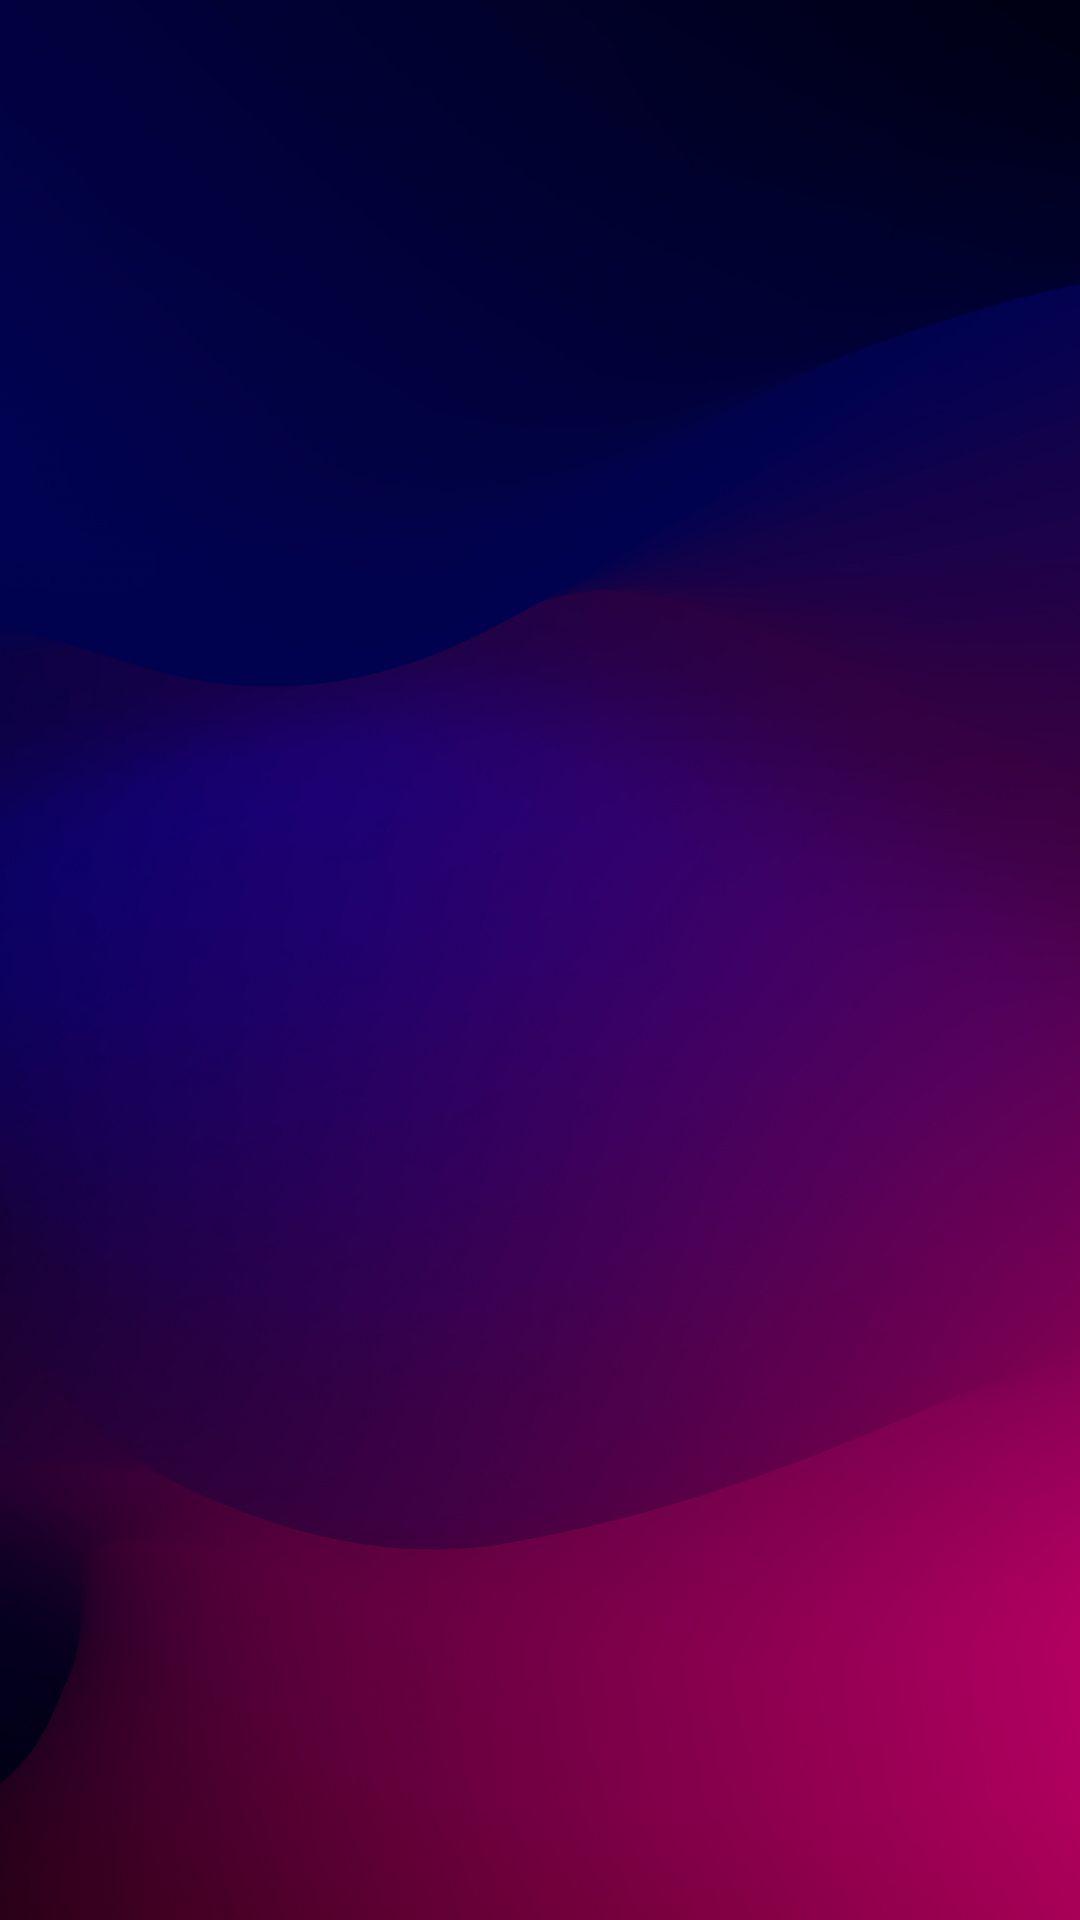 Dark Abstract Simple Colors Blur 1080x1920 Wallpaper Black And Purple Wallpaper Purple Wallpaper Android Wallpaper